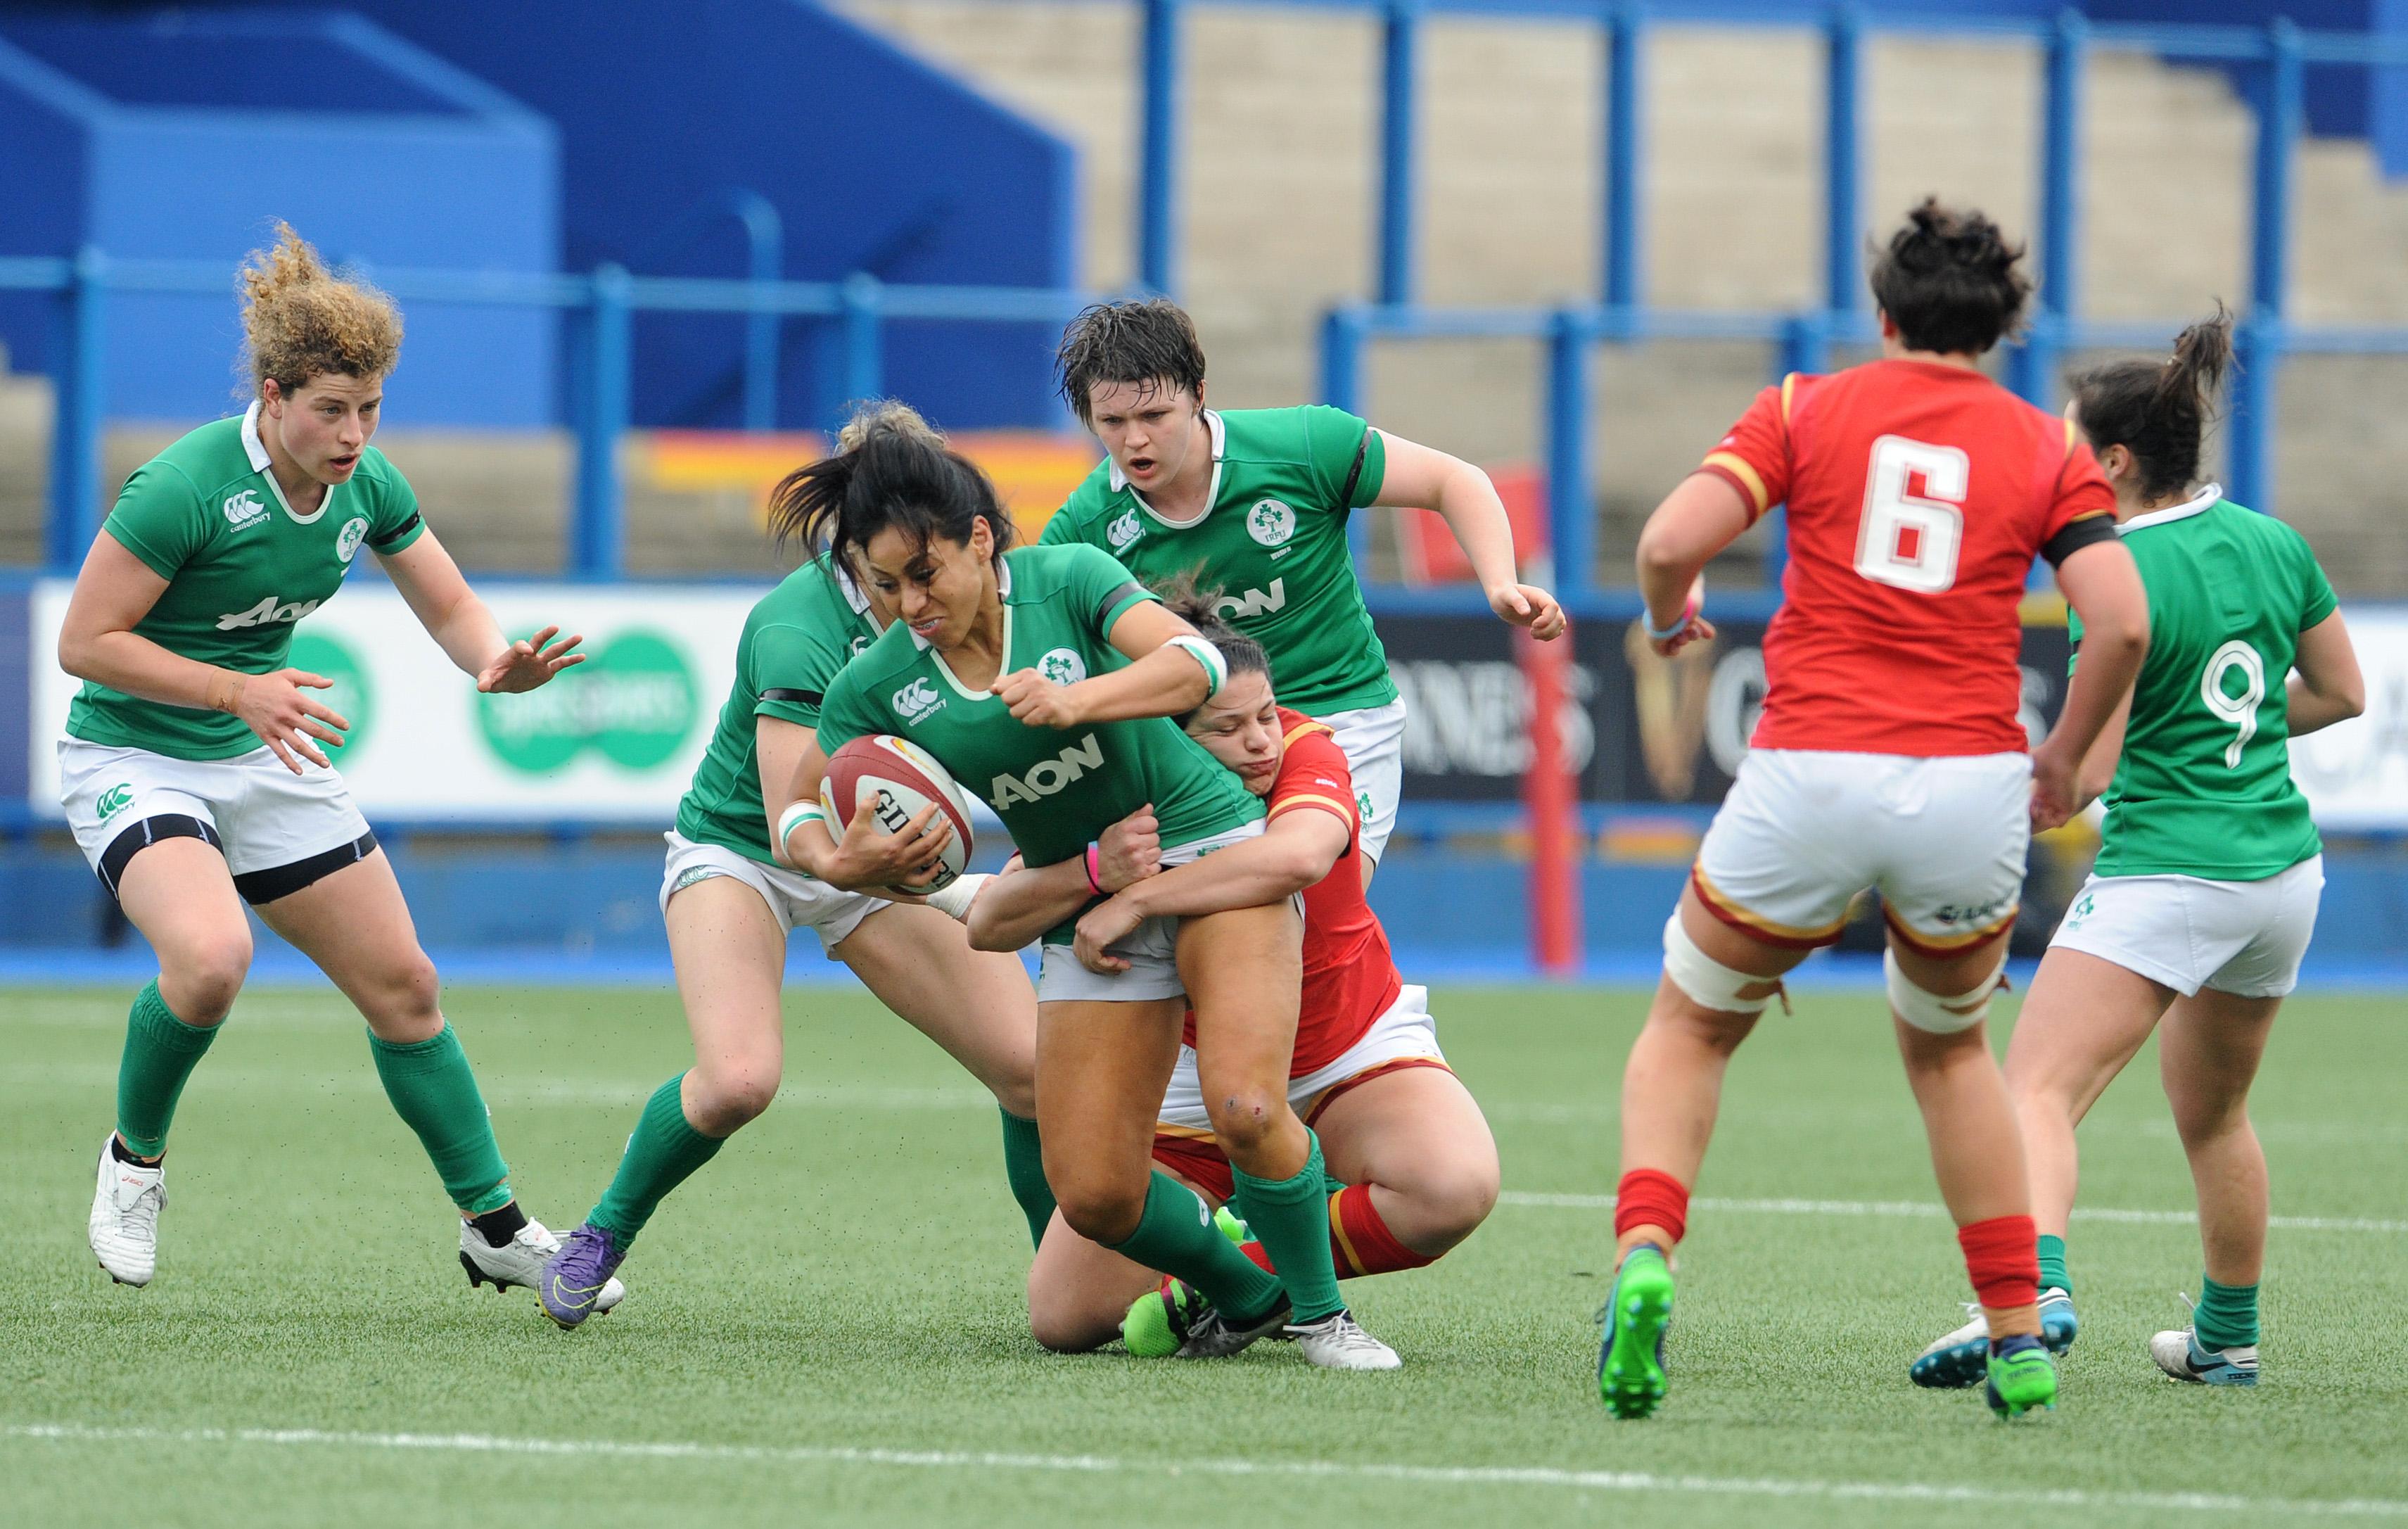 Sene Naoupu is tackled by Rebecca De Filippo